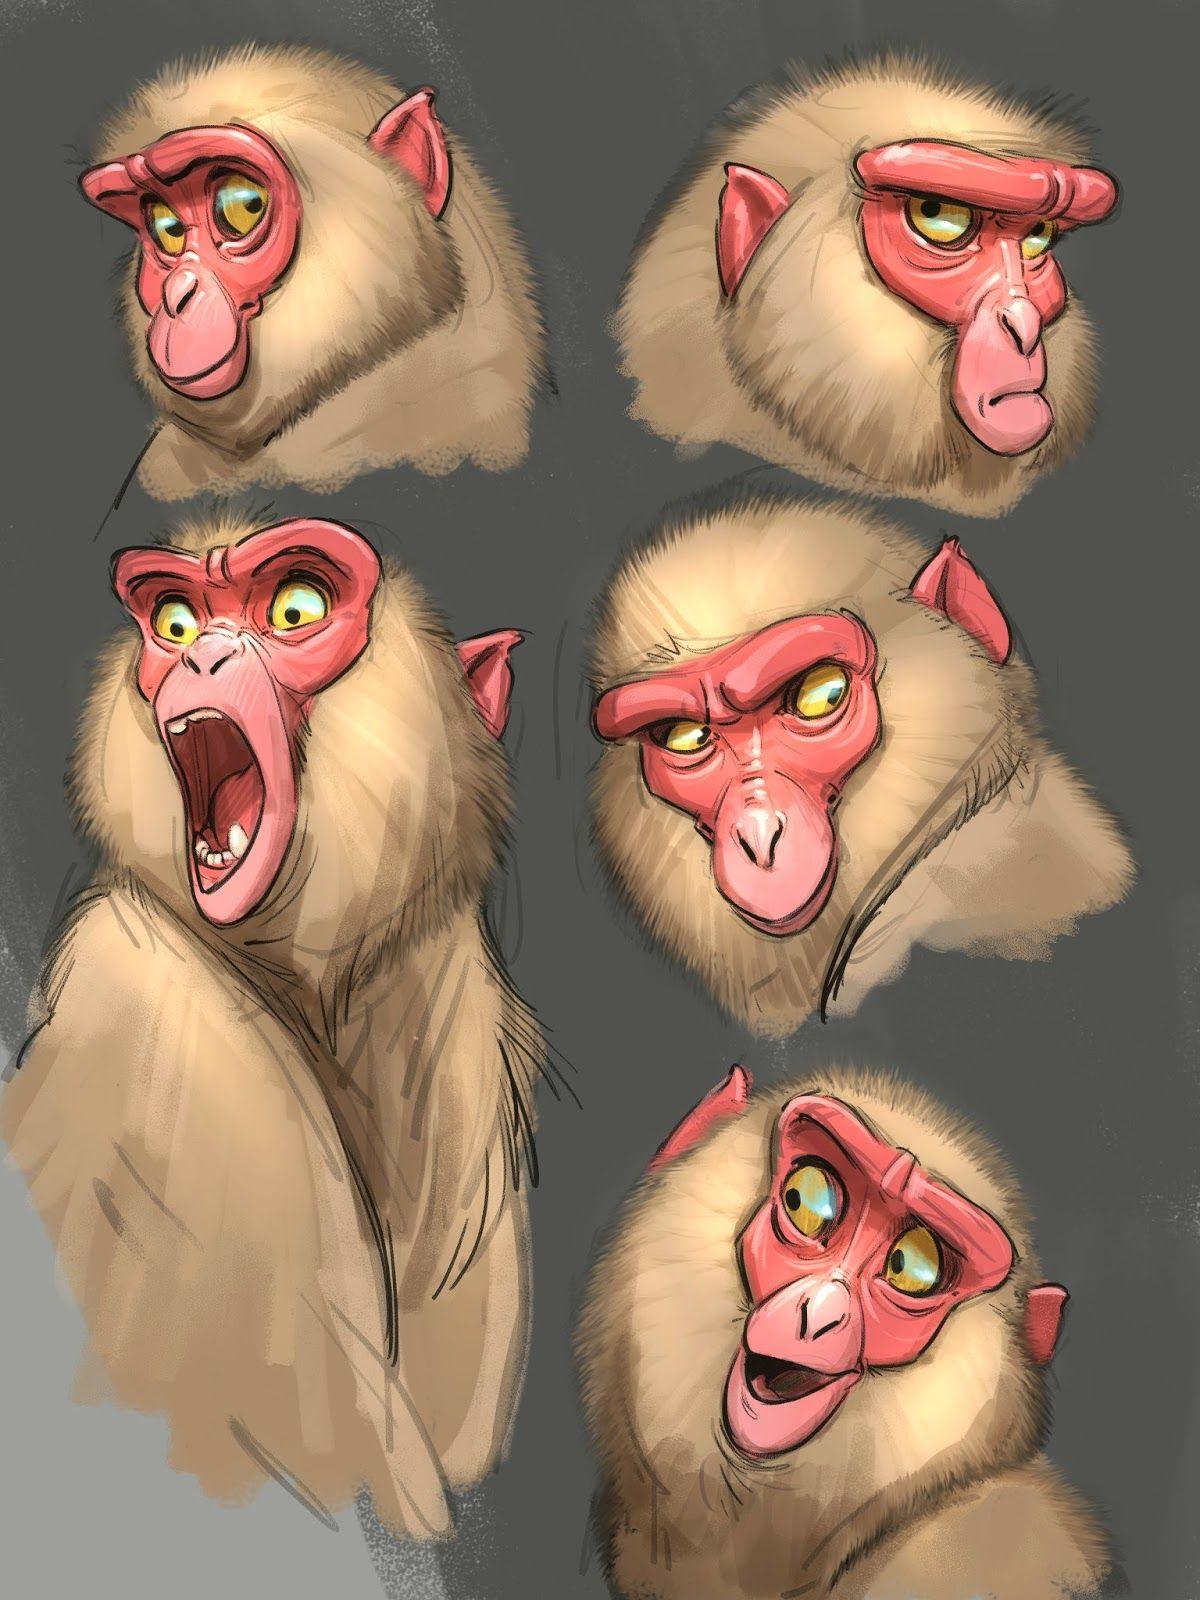 The Art of Aaron Blaise* © - Blog/Website   (www.creatureartteacher.com) ★    CHARACTER DESIGN REFERENCES   マンガの描き方 •